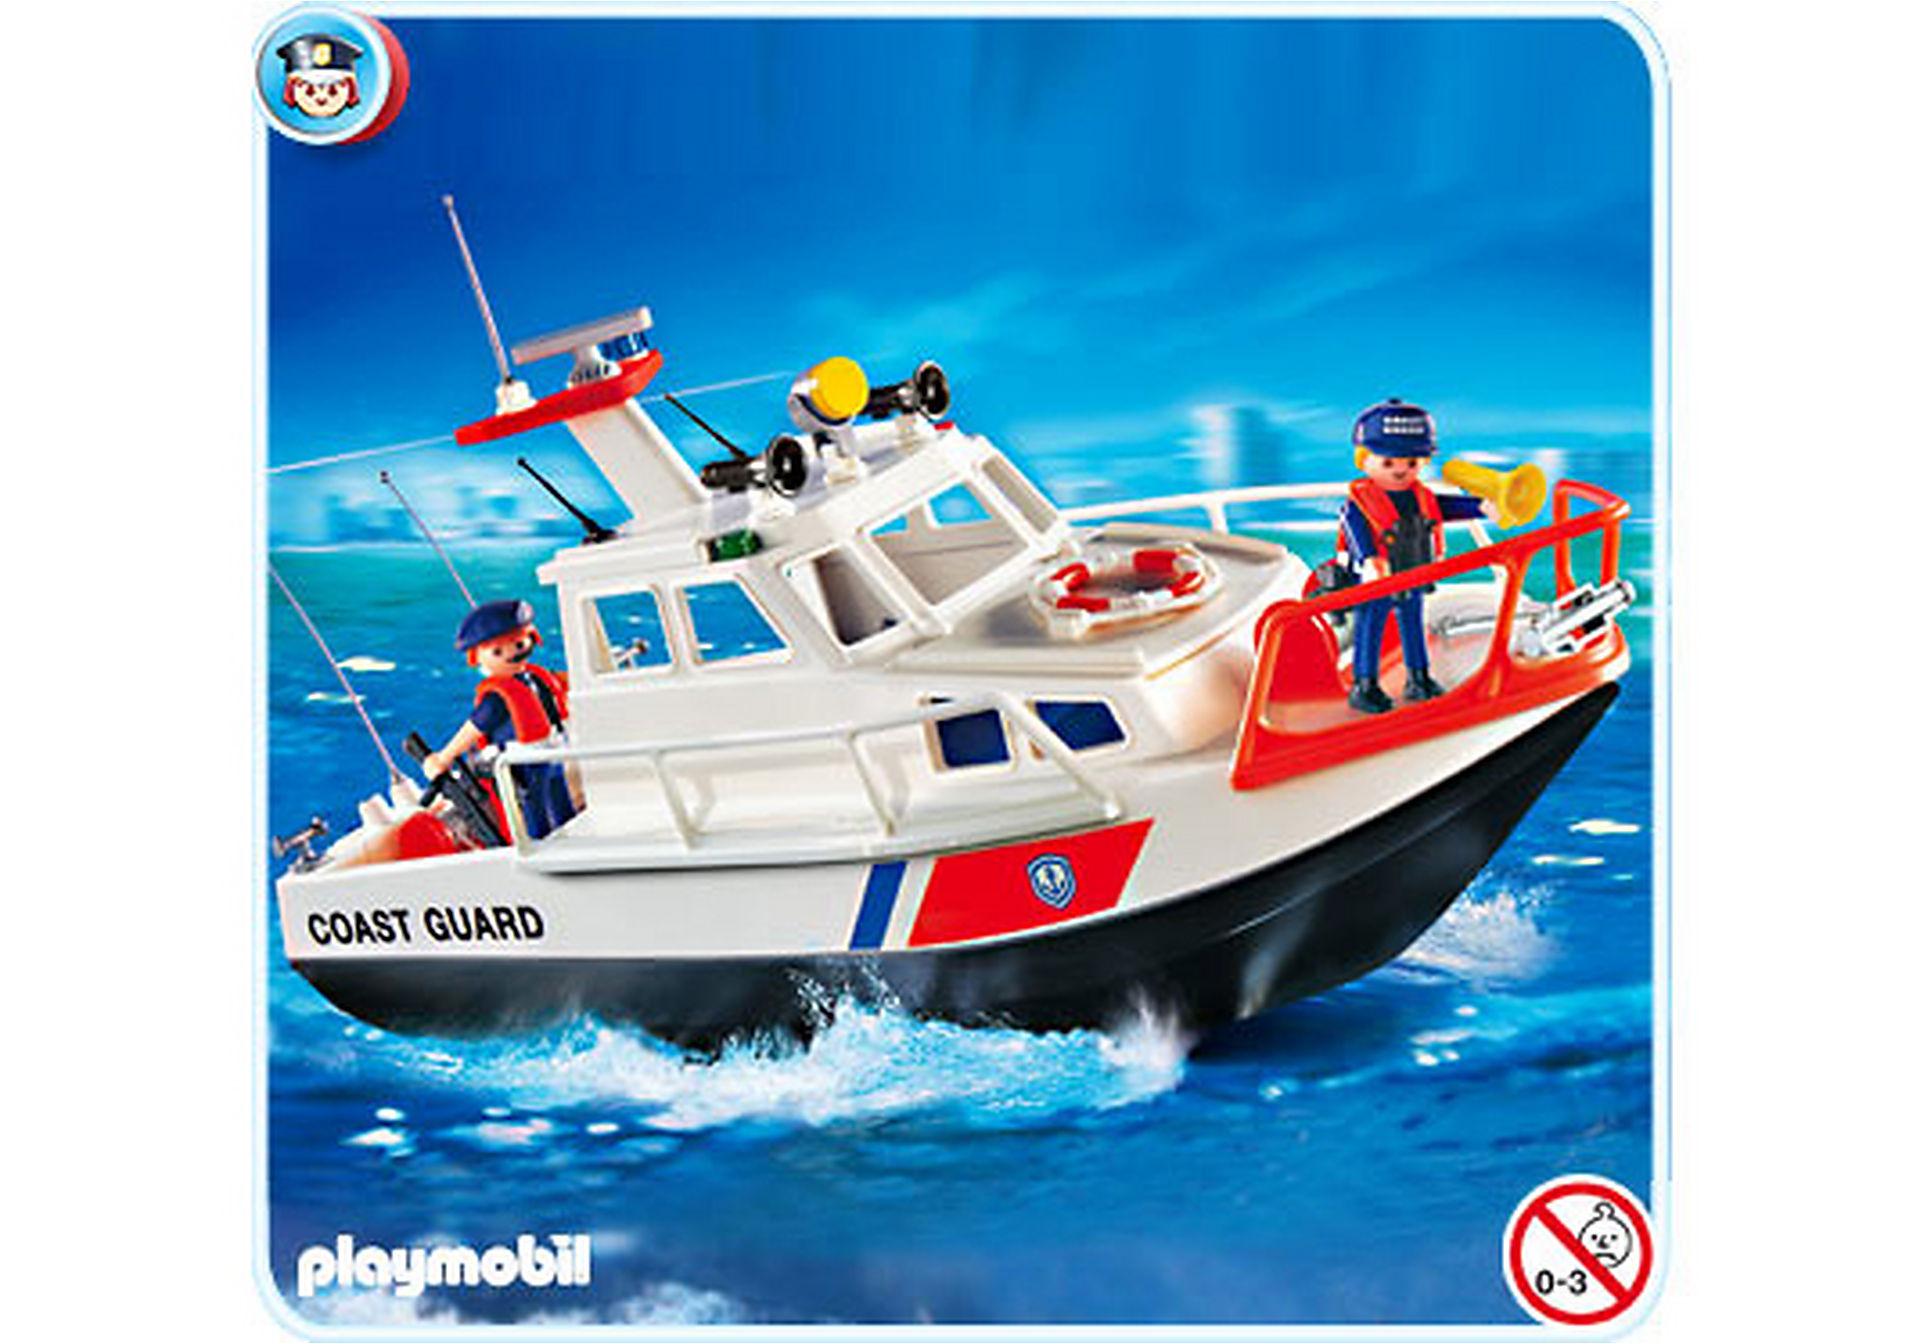 http://media.playmobil.com/i/playmobil/4448-A_product_detail/Küstenwachboot